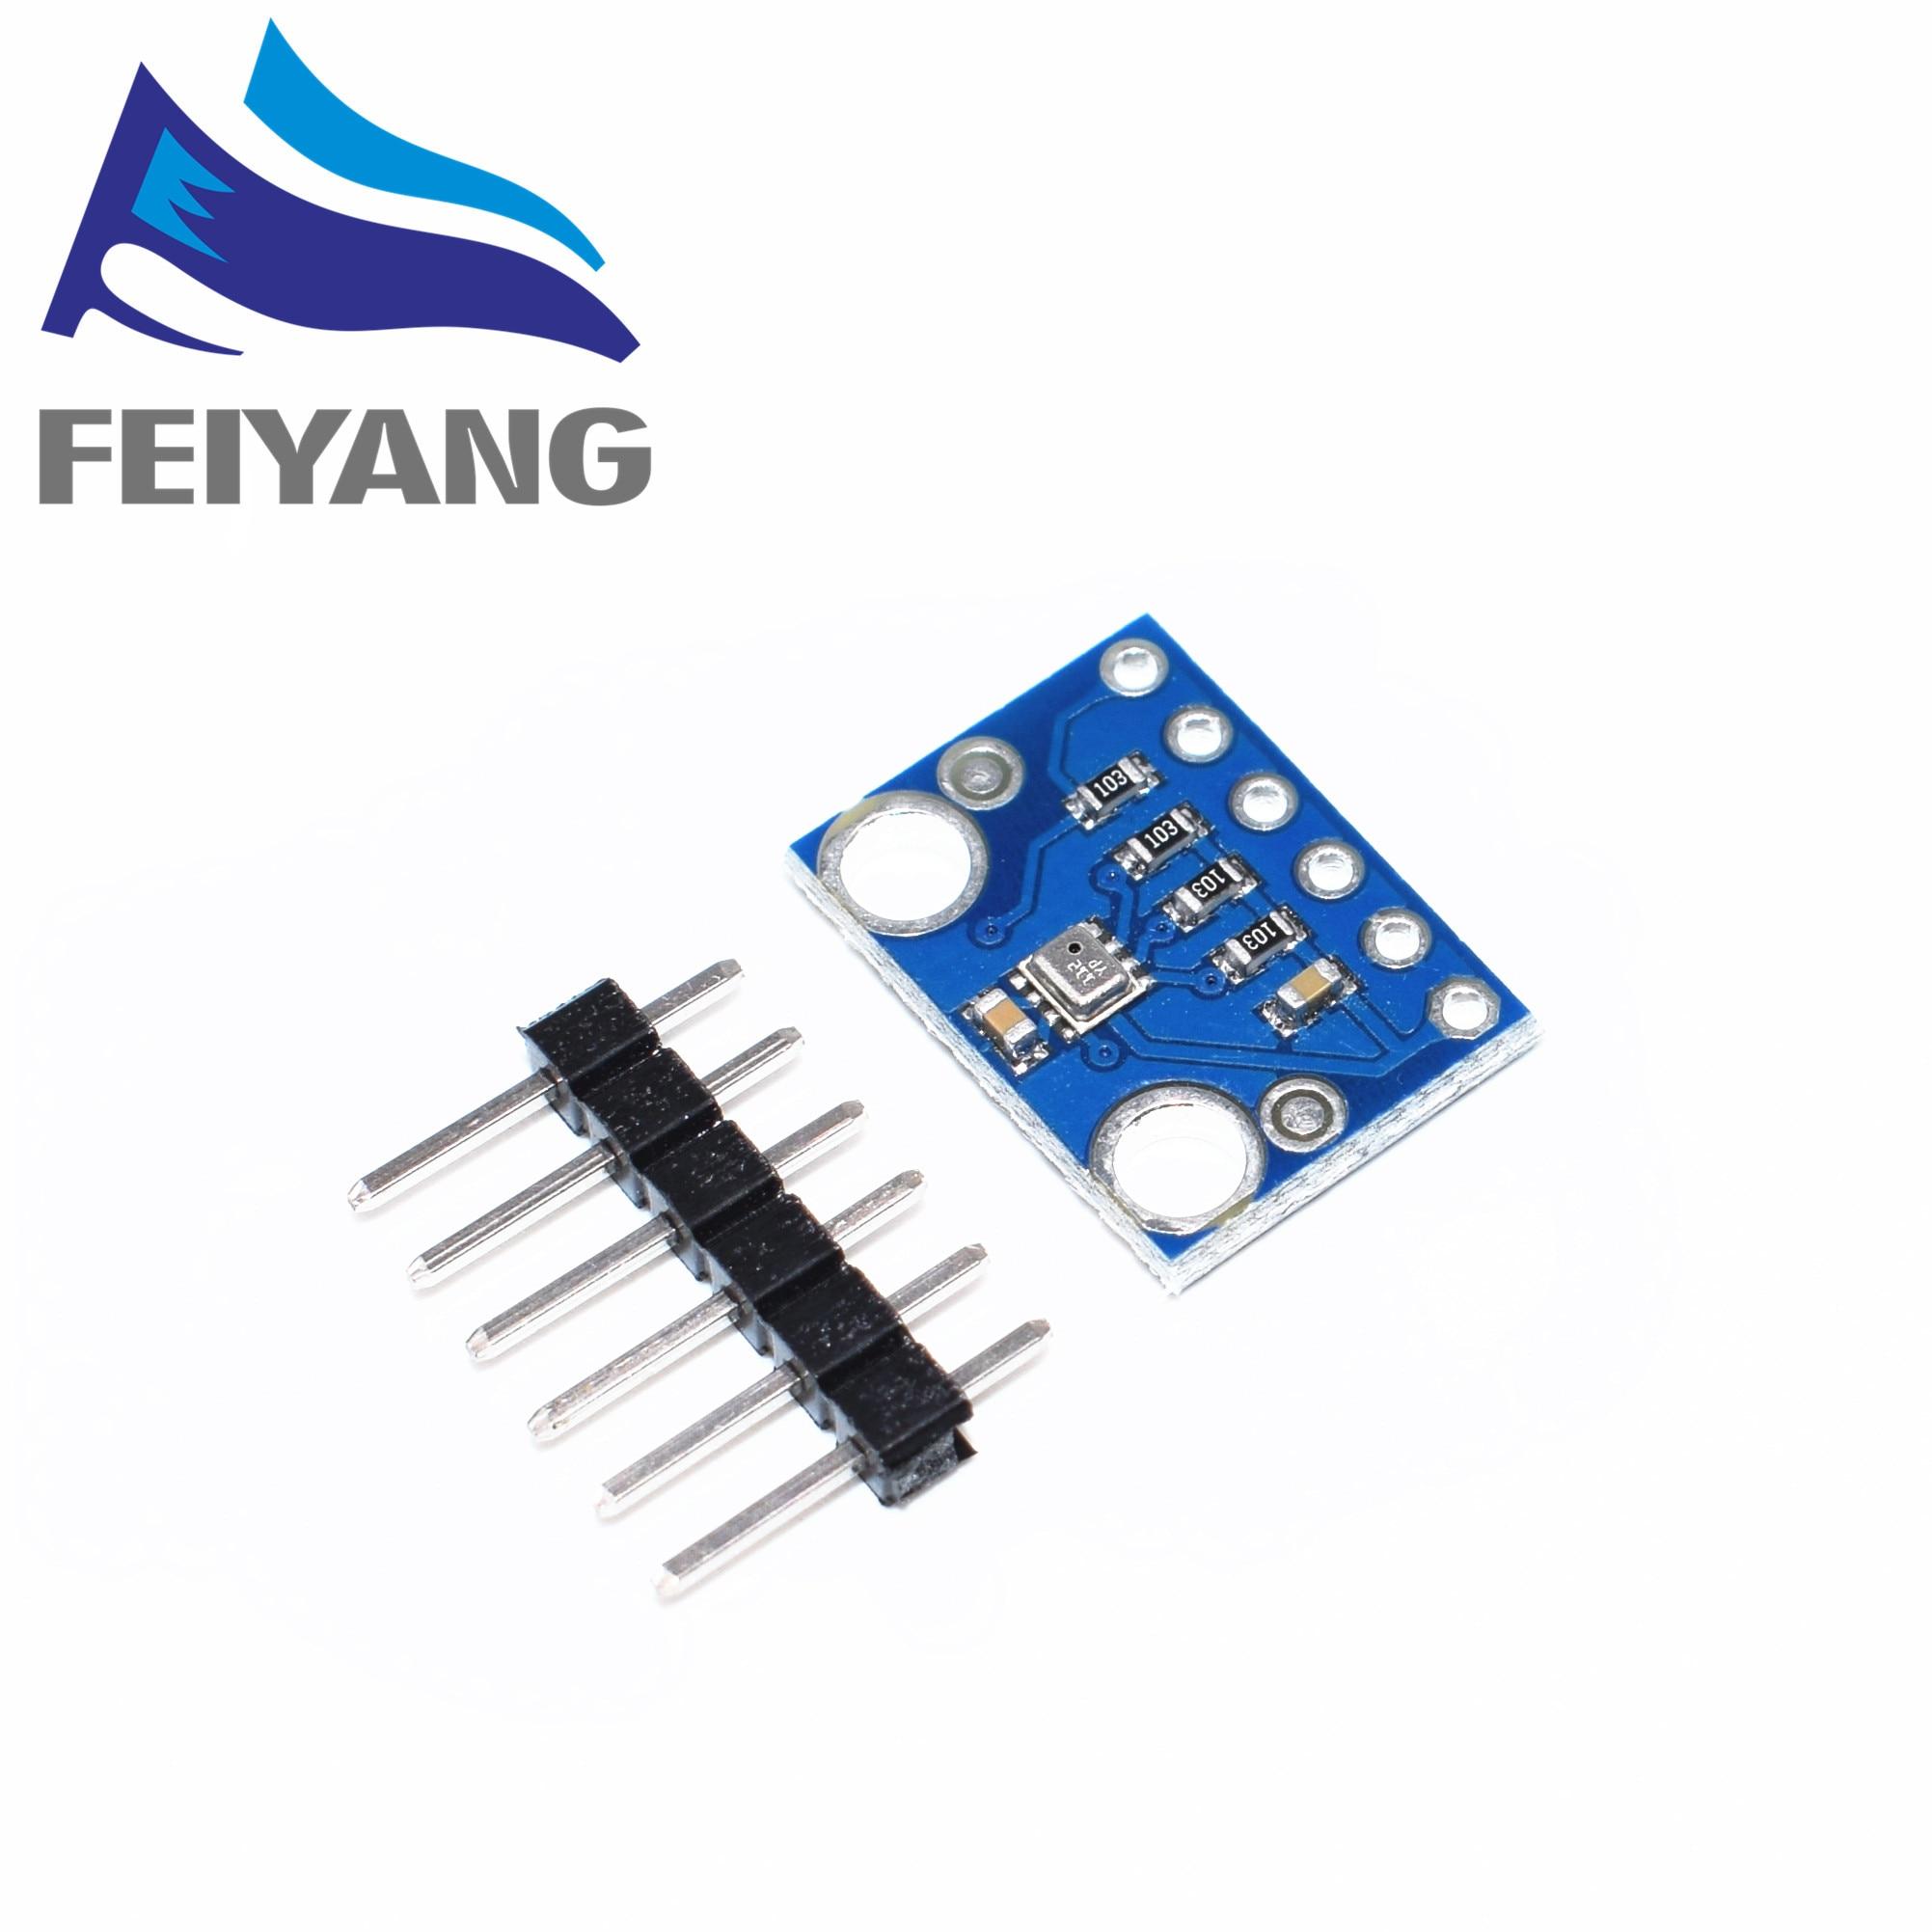 Active Components Integrated Circuits Search For Flights 1pcs Samiore Robot I2c/spi Bmp280 3.3 Bmp280-3.3 Digital Barometric Pressure Altitude Sensor High Precision Atmospheric Module